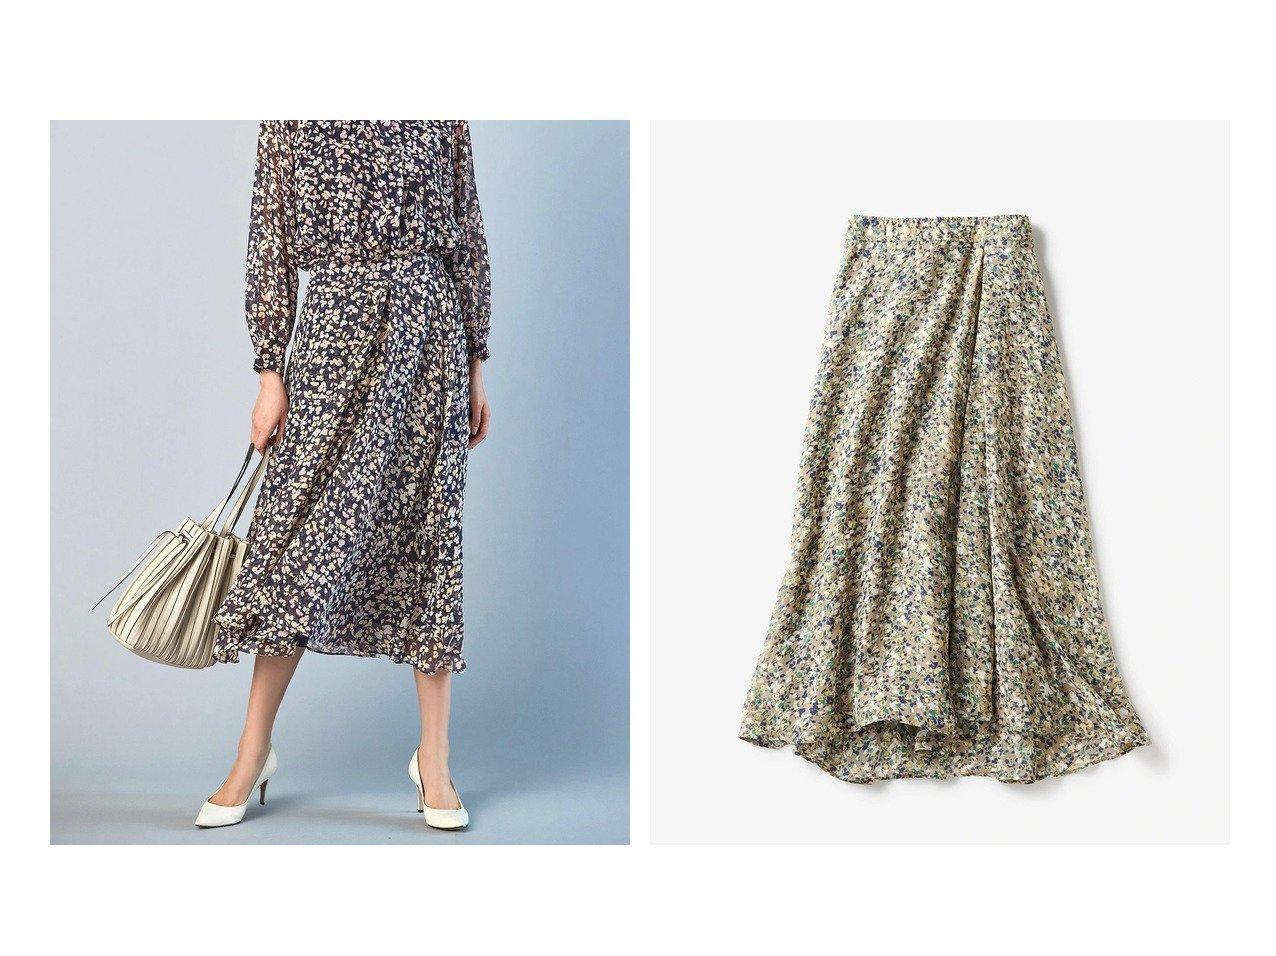 【DoCLASSE/ドゥクラッセ】のフラワーシフォン・フレアスカート ドゥクラッセの40代、50代の方におすすめ!人気トレンド・ファッションの通販 おすすめで人気の流行・トレンド、ファッションの通販商品 メンズファッション・キッズファッション・インテリア・家具・レディースファッション・服の通販 founy(ファニー) https://founy.com/ ファッション Fashion レディースファッション WOMEN スカート Skirt Aライン/フレアスカート Flared A-Line Skirts シフォン フレア |ID:crp329100000021644